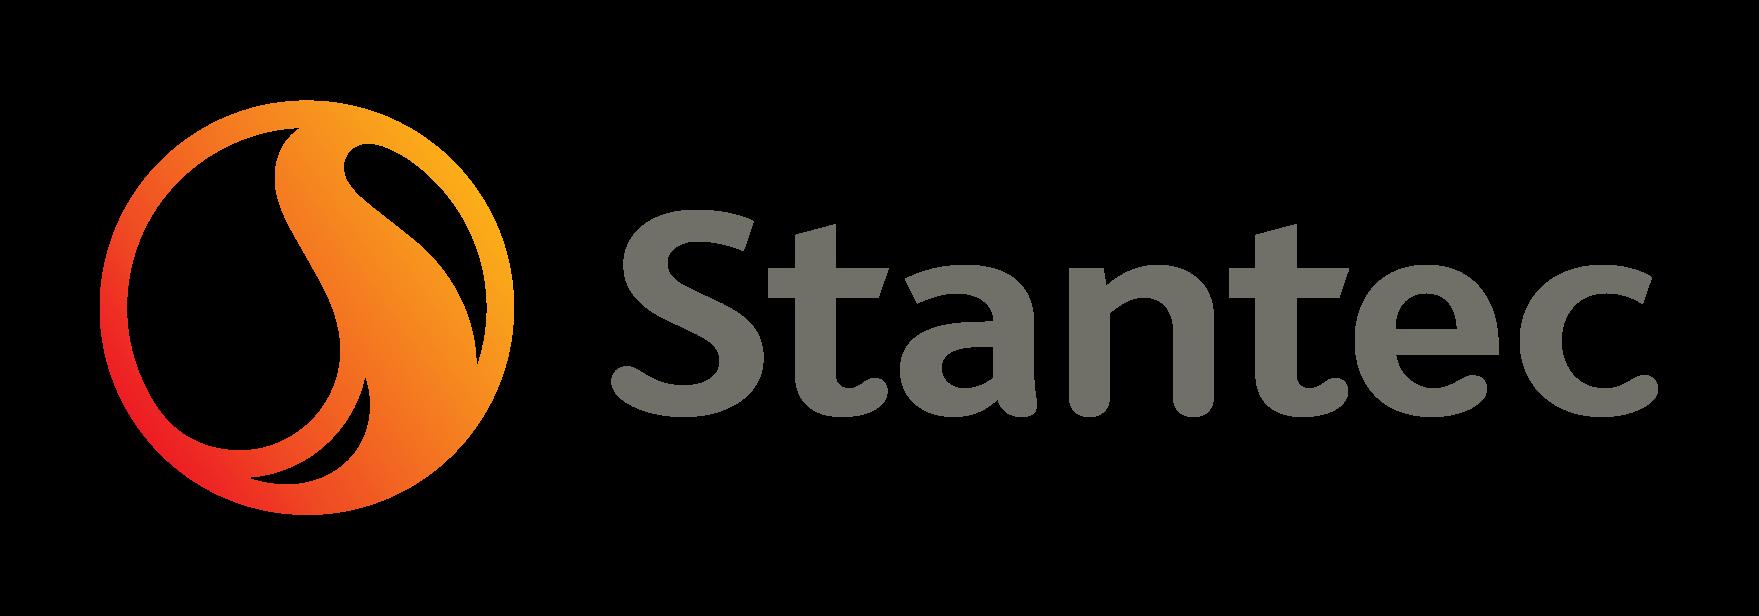 Stantec-logo1.PNG